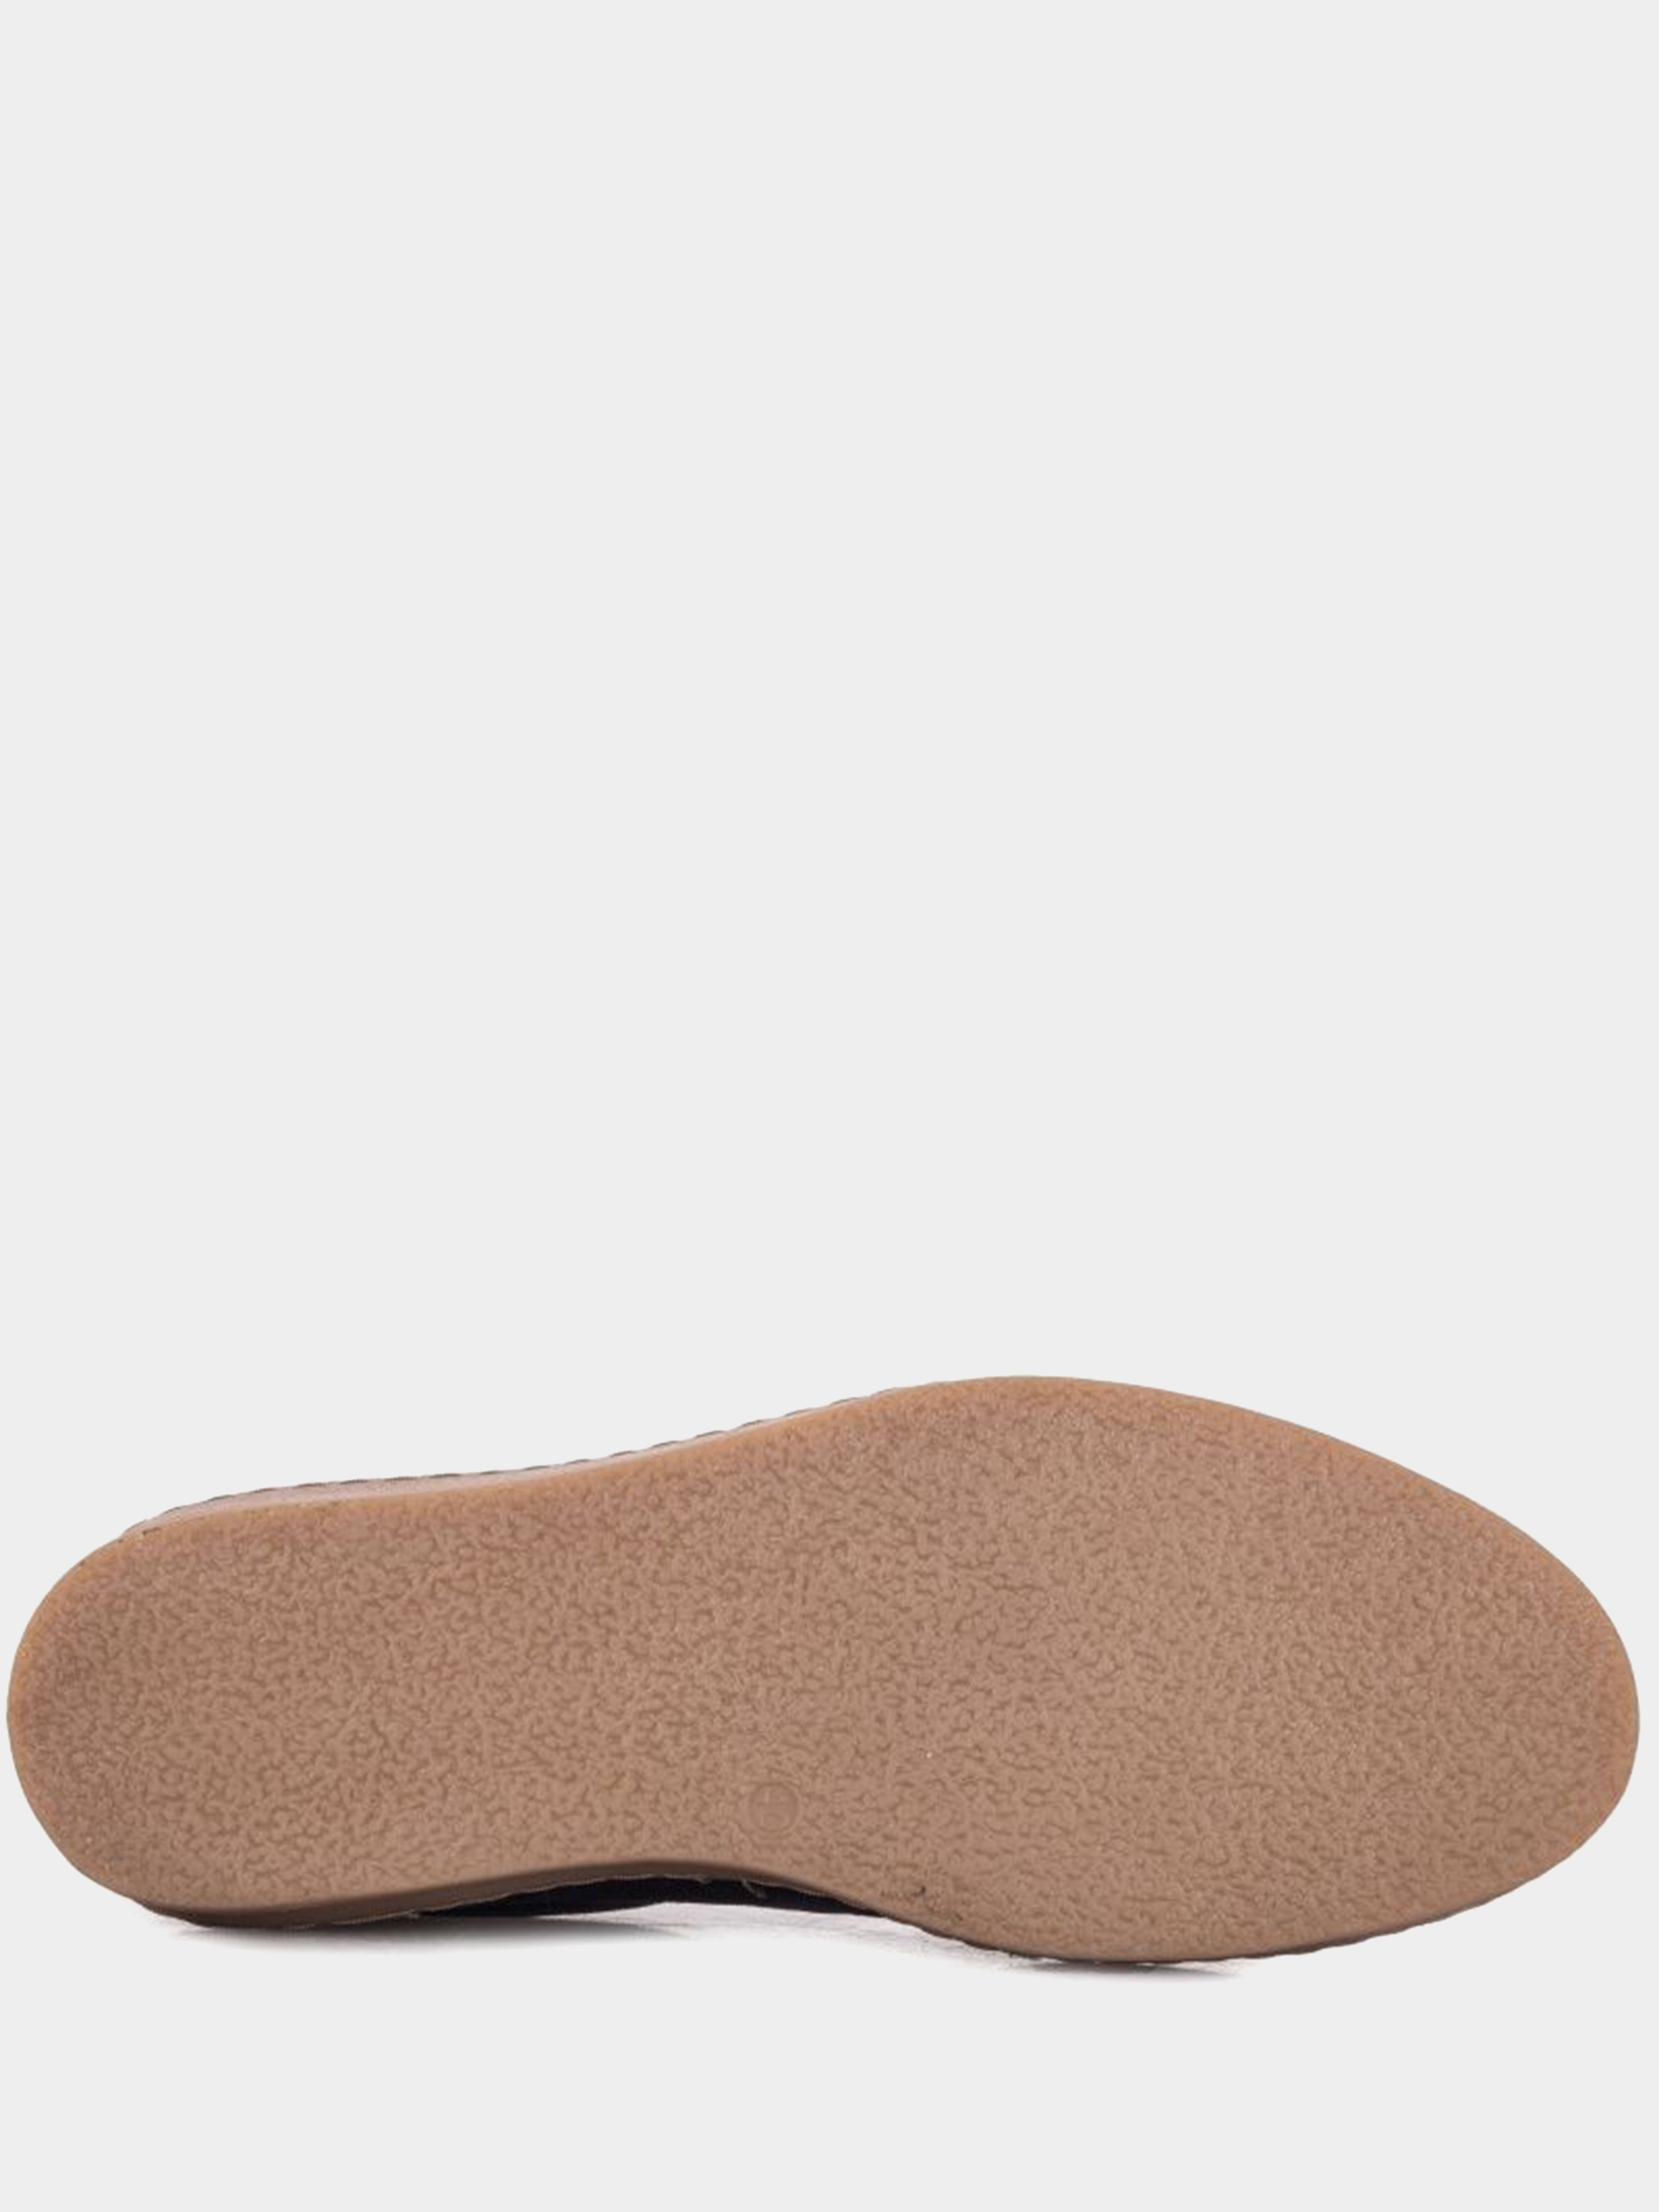 Полуботинки мужские MEXX Can 7M13 размеры обуви, 2017